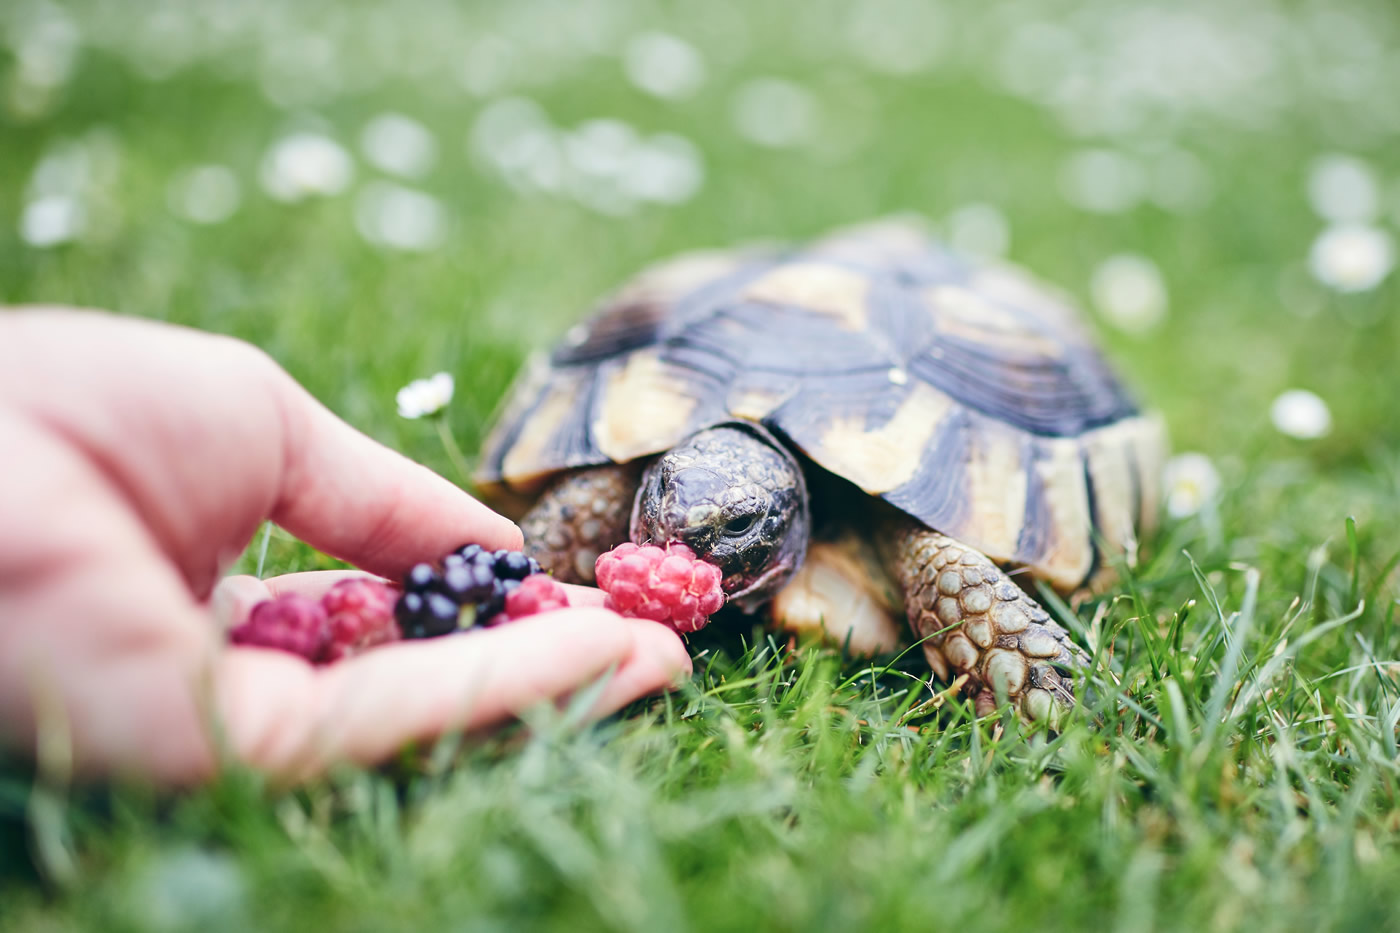 Feeding your turtle